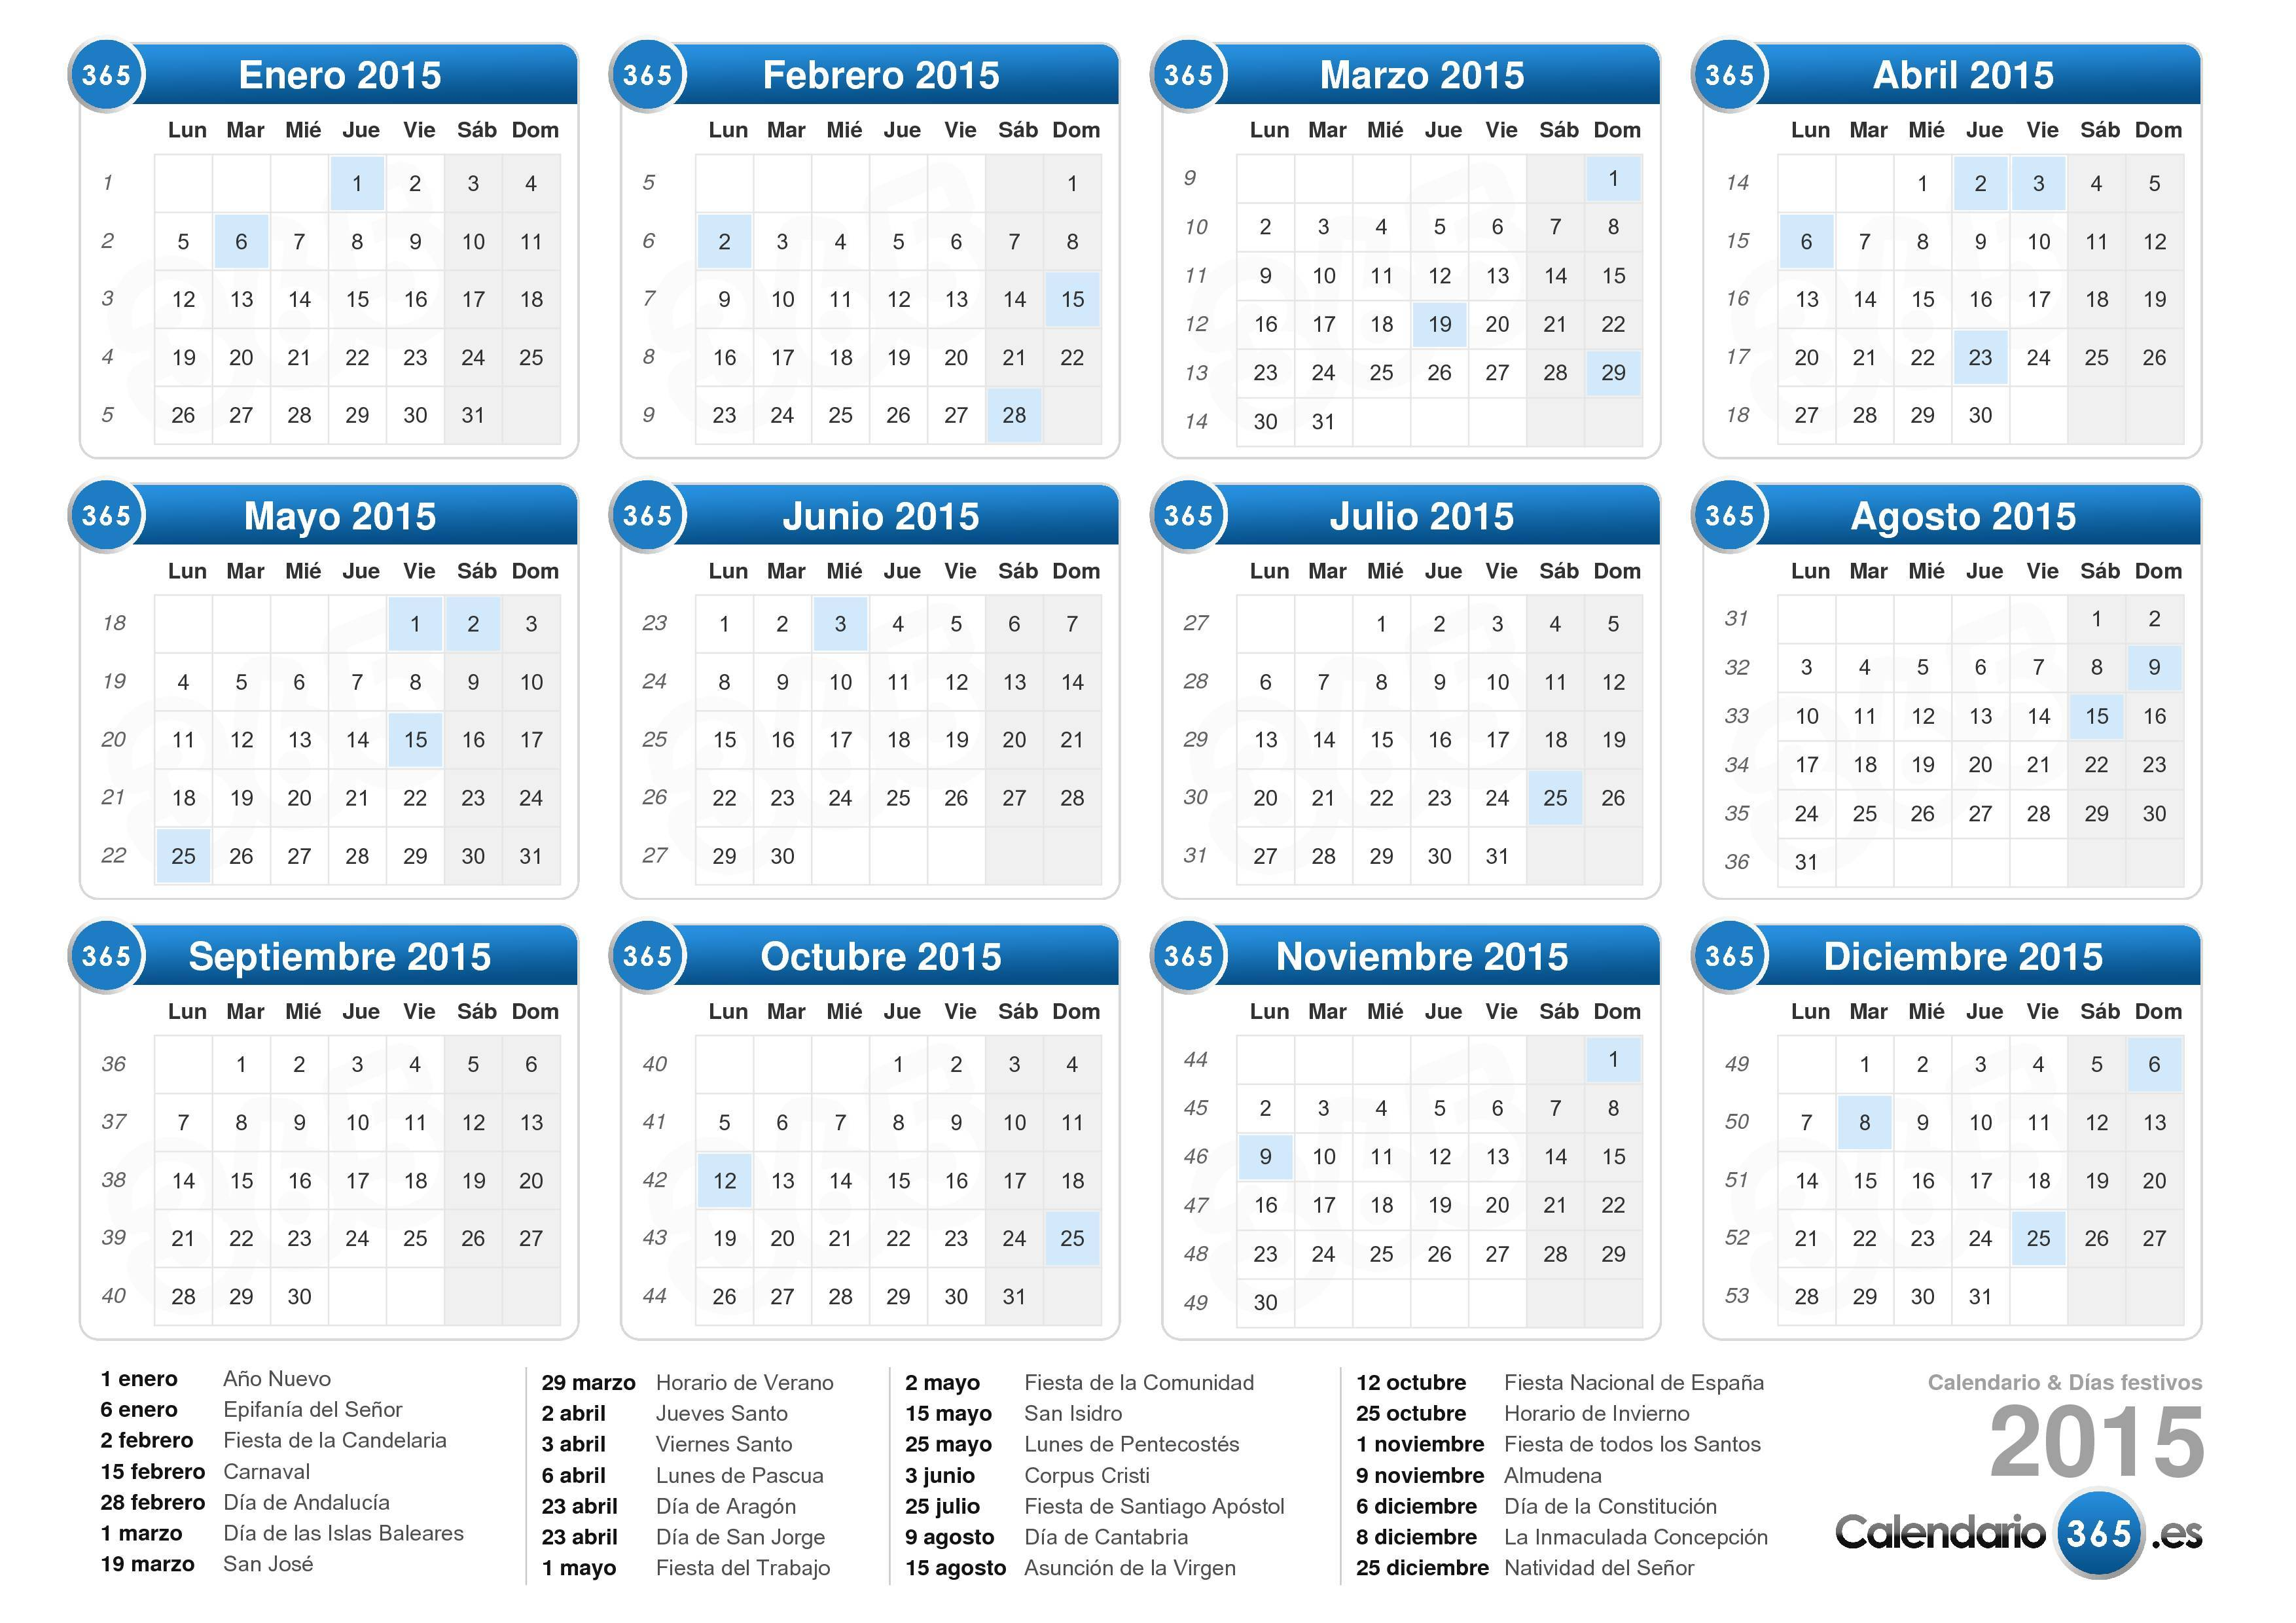 Calendario 2015 for Calendario 2015 ministerio del interior